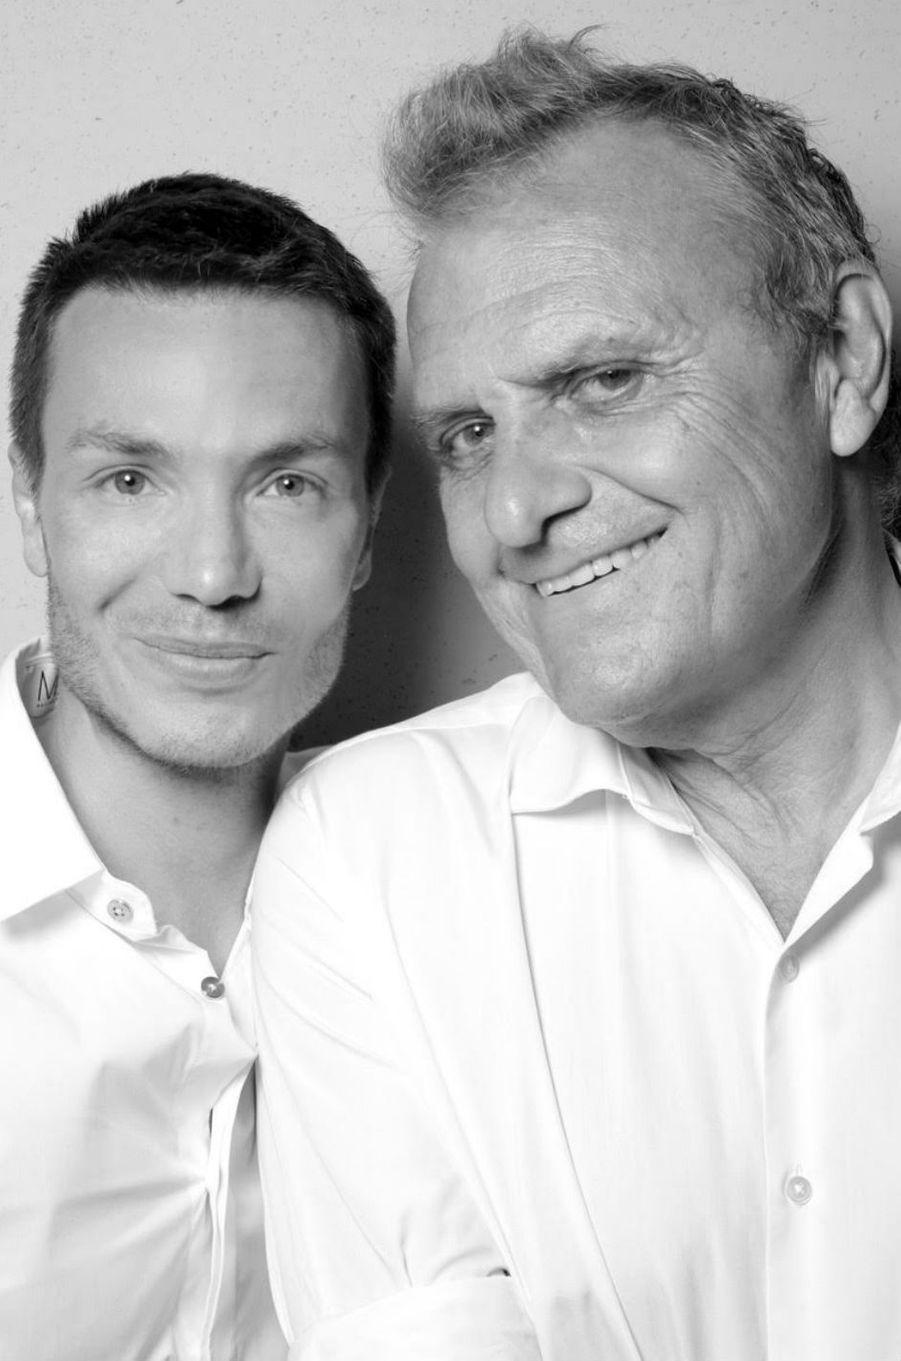 Maxime Simoens et Jean-Charles de Castelbajac